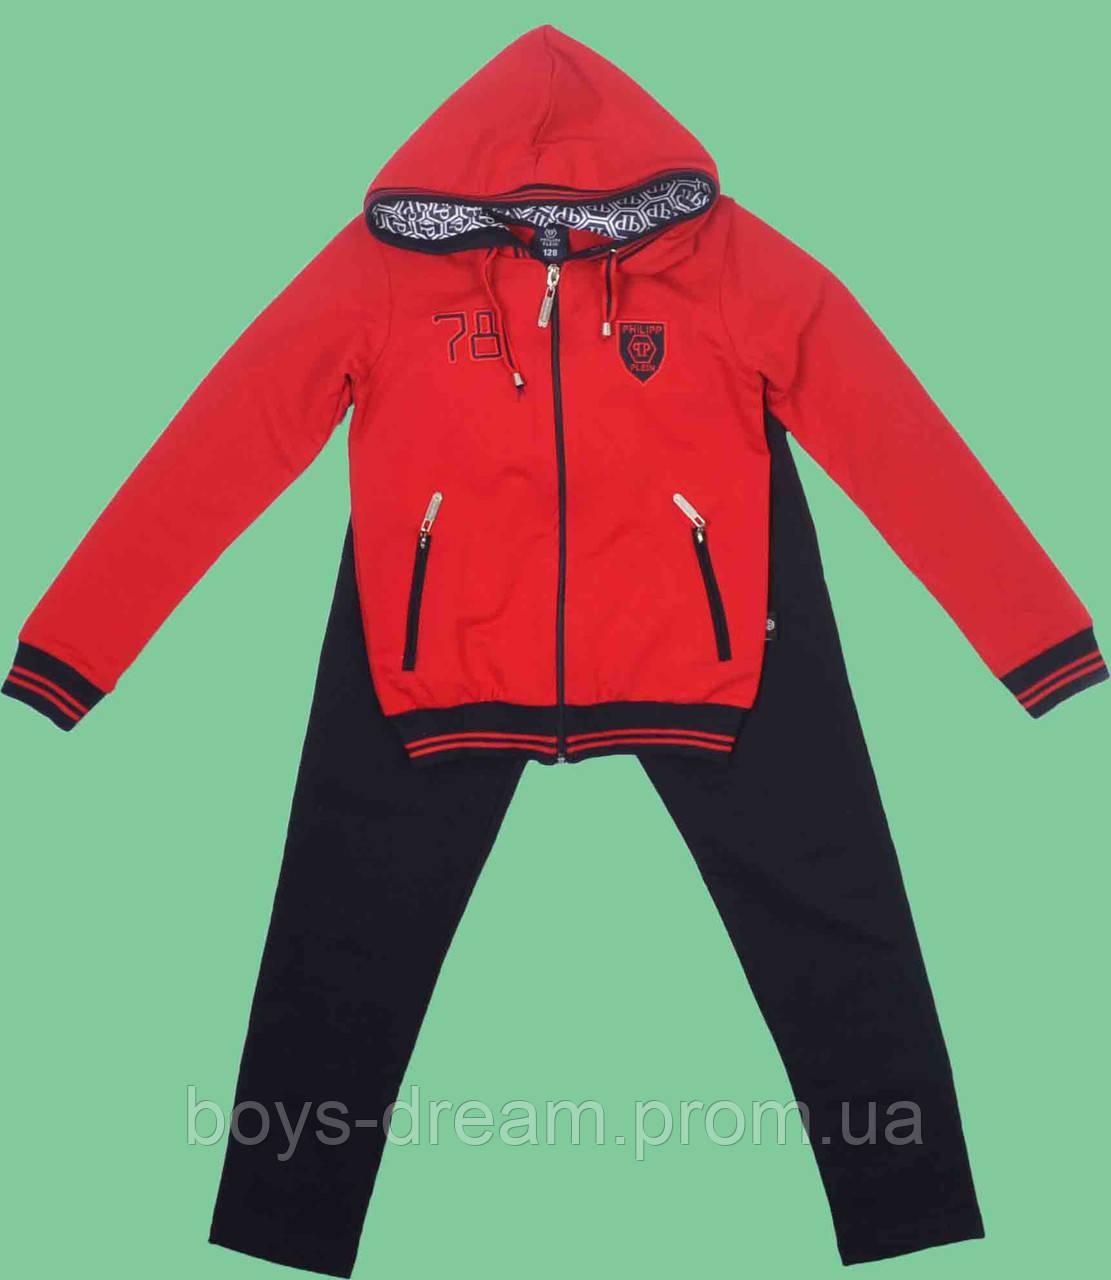 Спортивный костюм для мальчика (146, 152)  Philipp Plein (Турция)